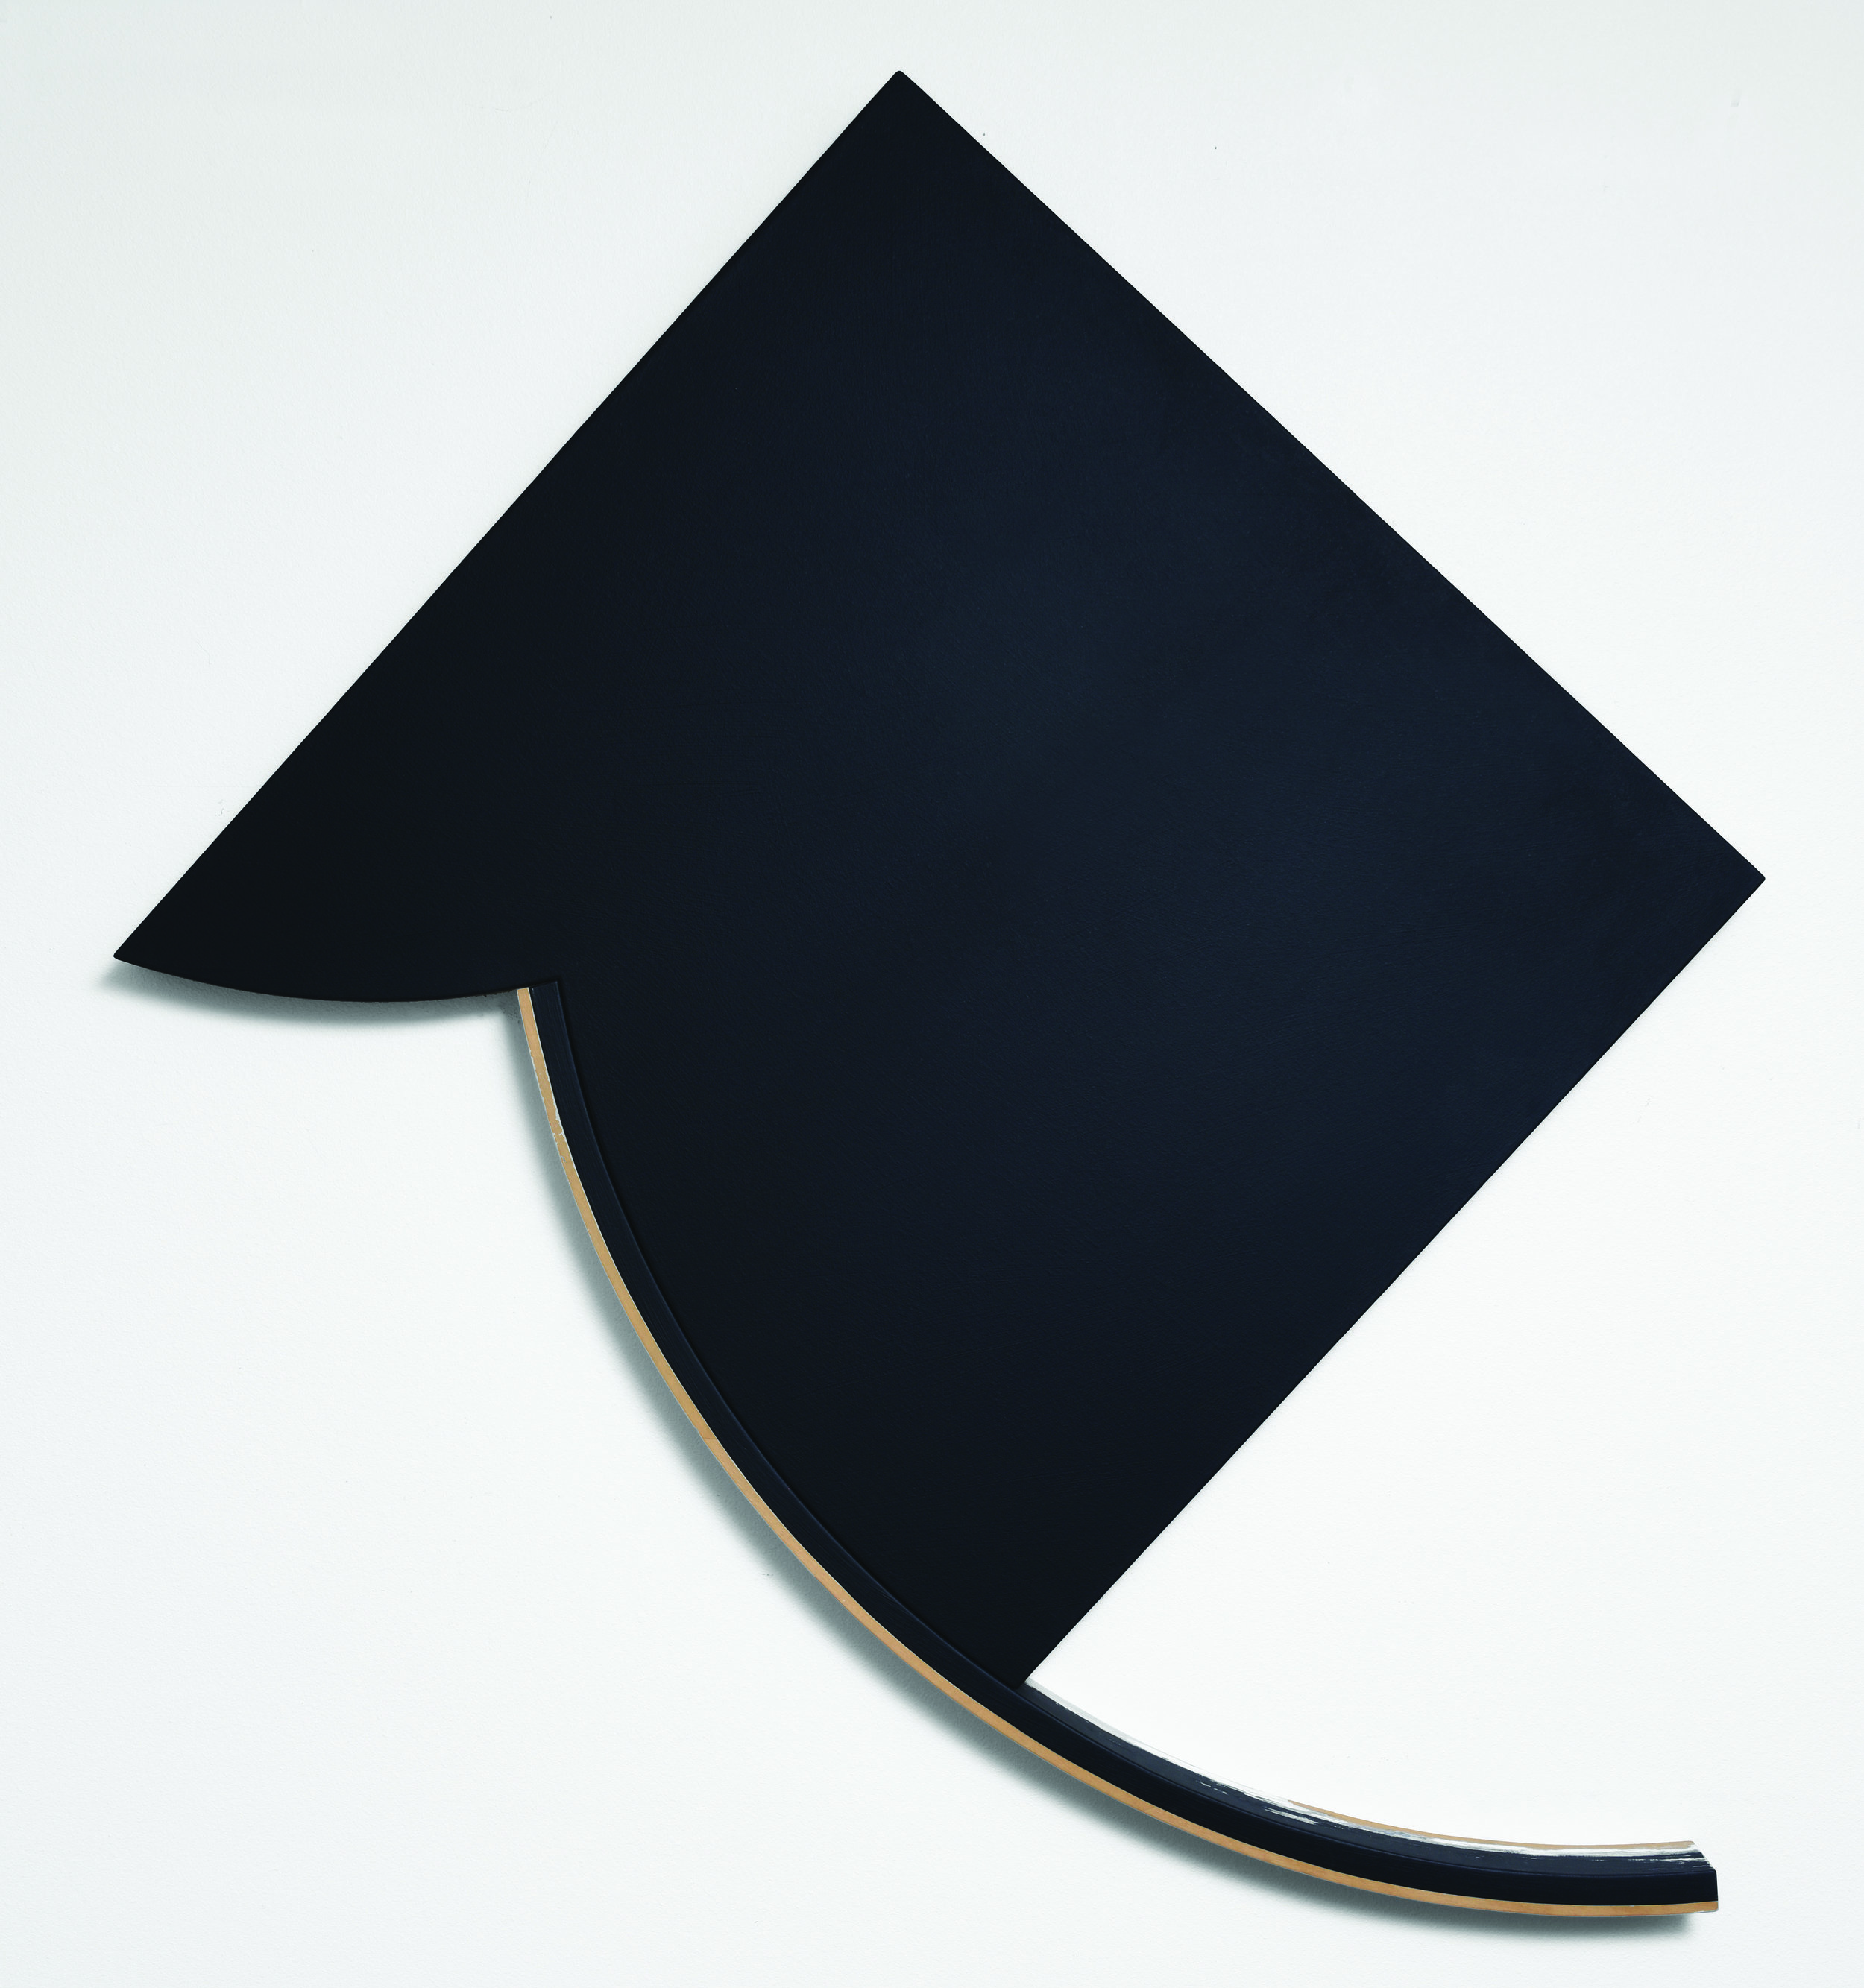 Thauma II, 1986 Wood, acrylic and canvas 69 x 50 x 4 inches Laguna Art Museum, Gift of Mason and Elizabeth Phelps